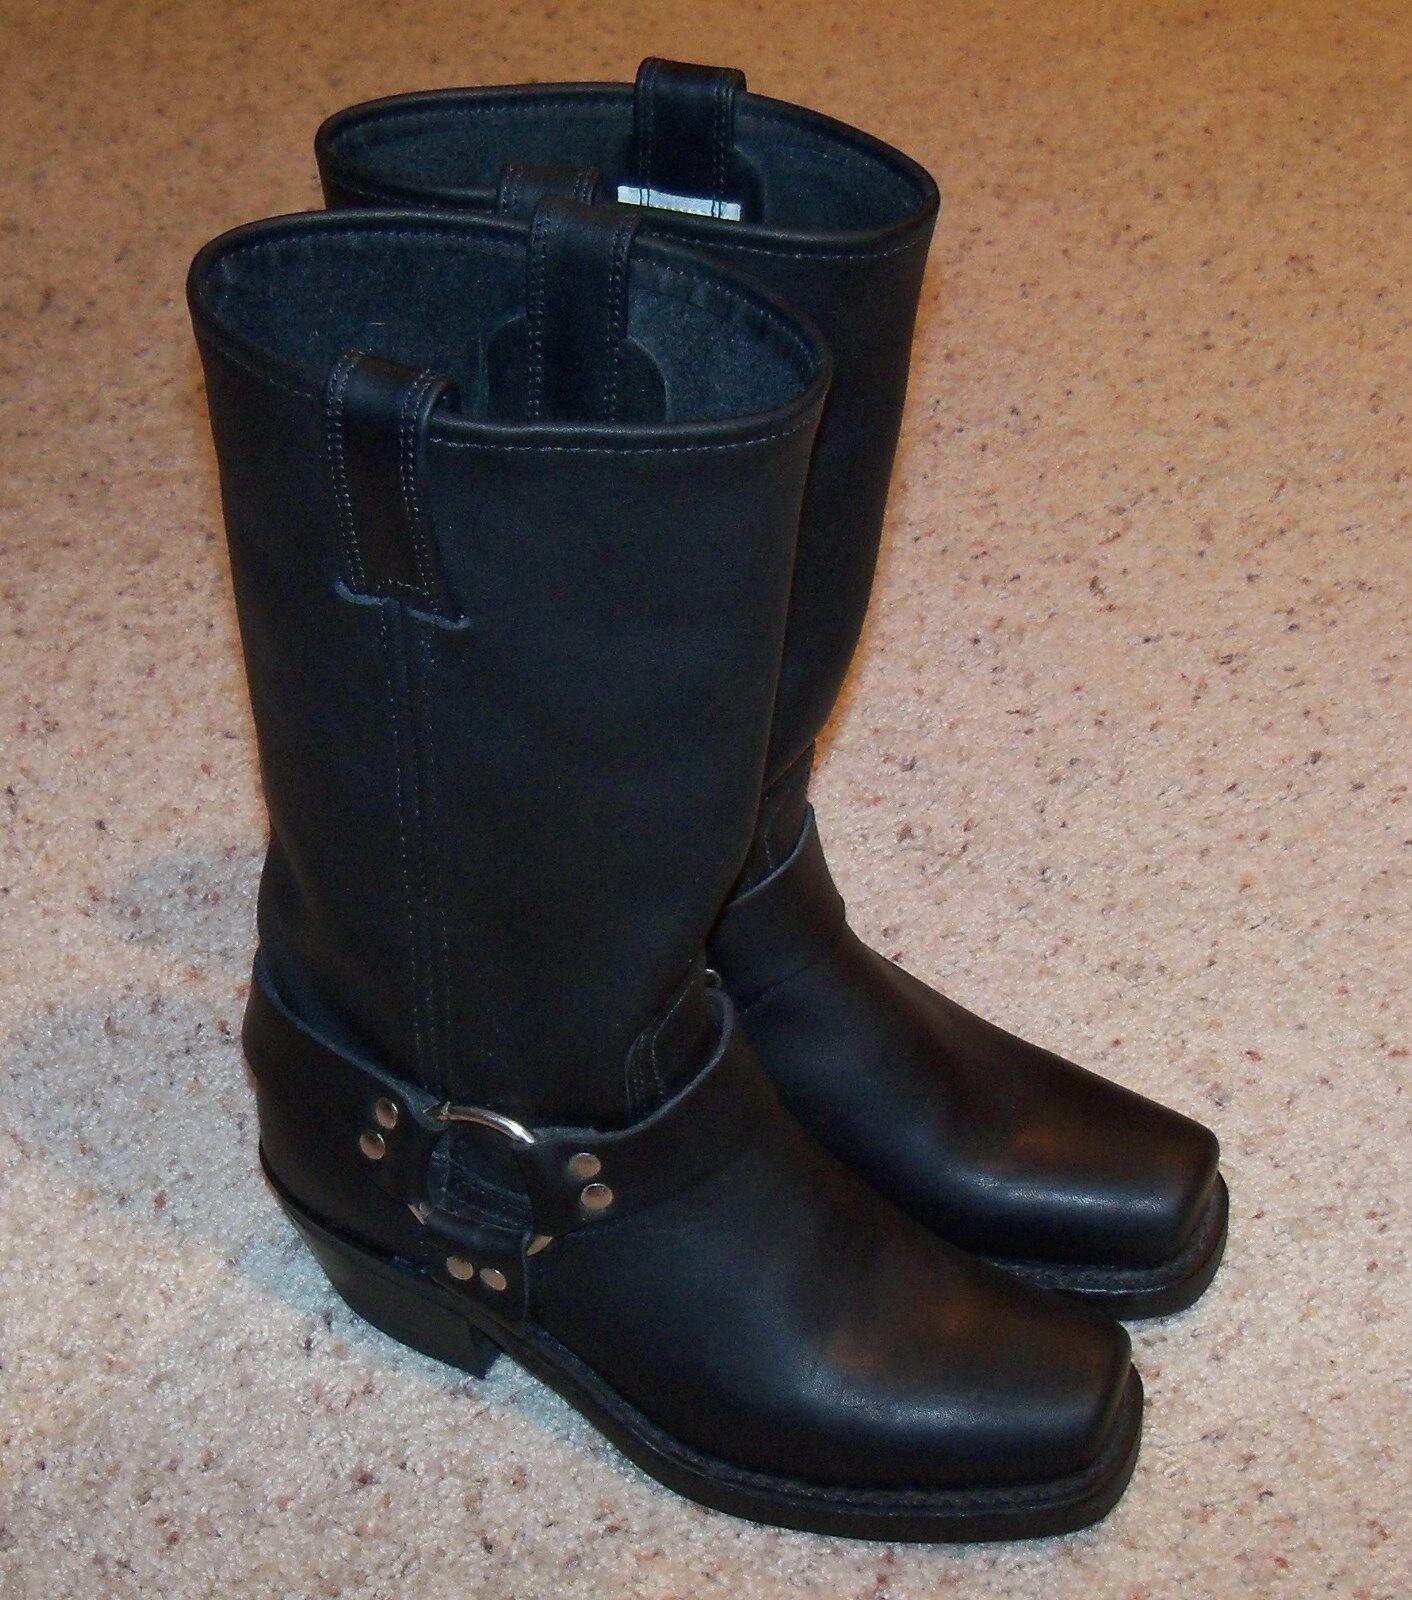 NEW FRYE Women's Black Leather 12R, Harness Harness Harness Biker Boots 6.5 M, 77300, Square Toe 36bce7